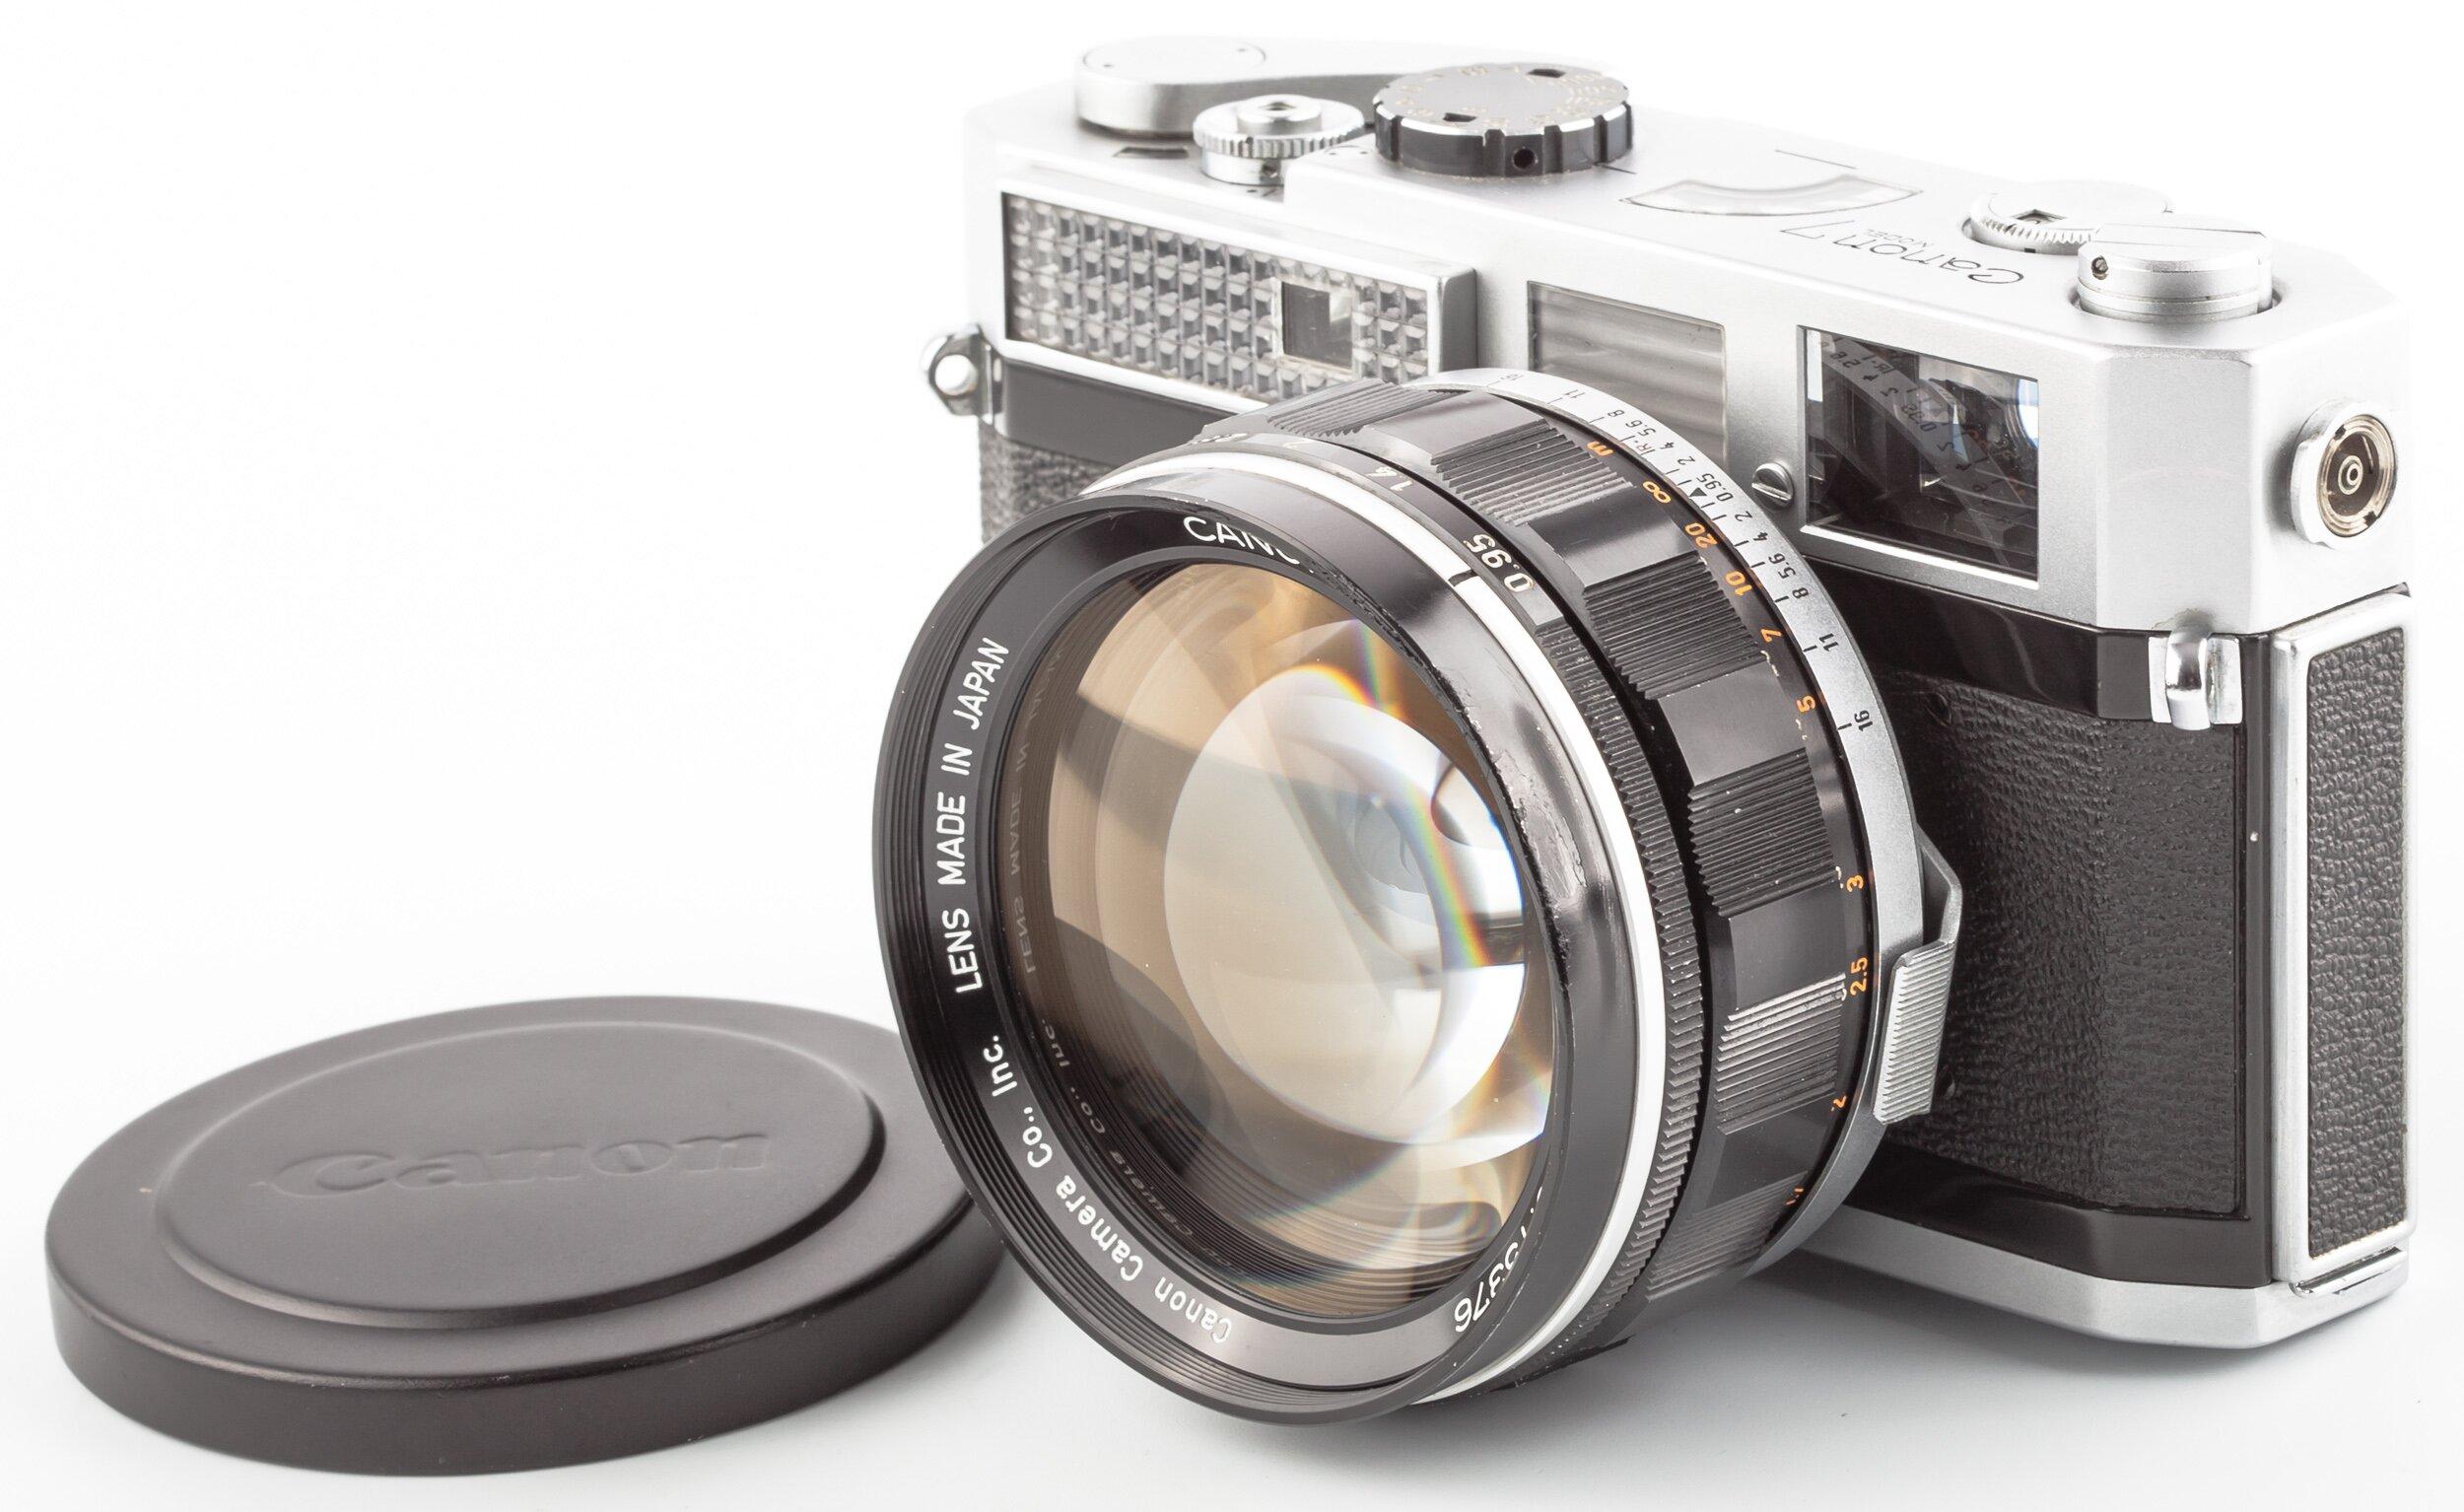 Canon 7 mit Canon Lens 50 mm 0,95